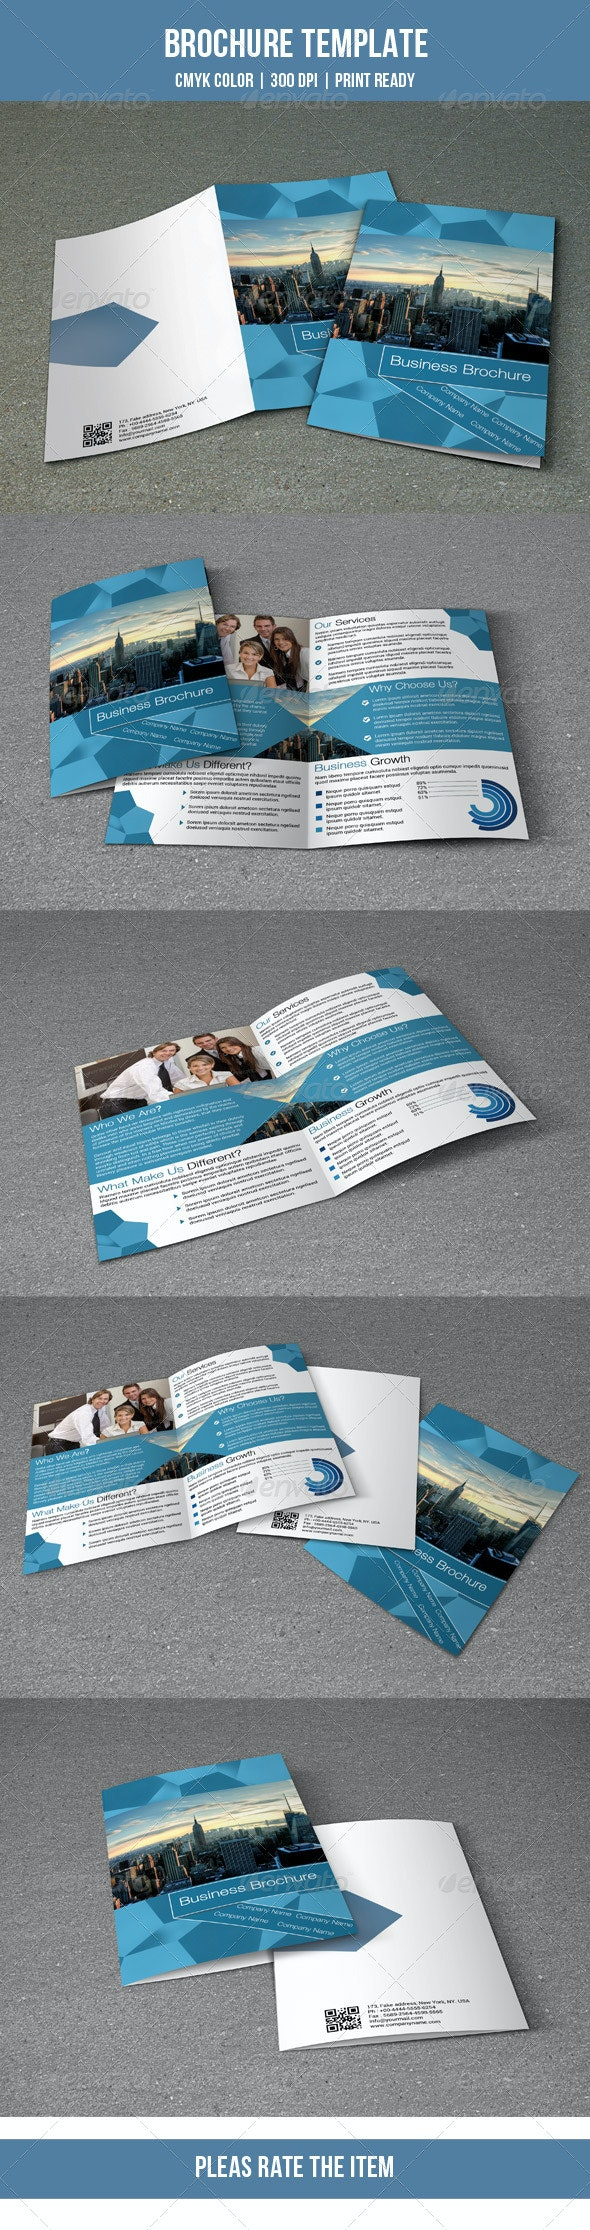 Corporate Brochure Template-V73 - Corporate Brochures